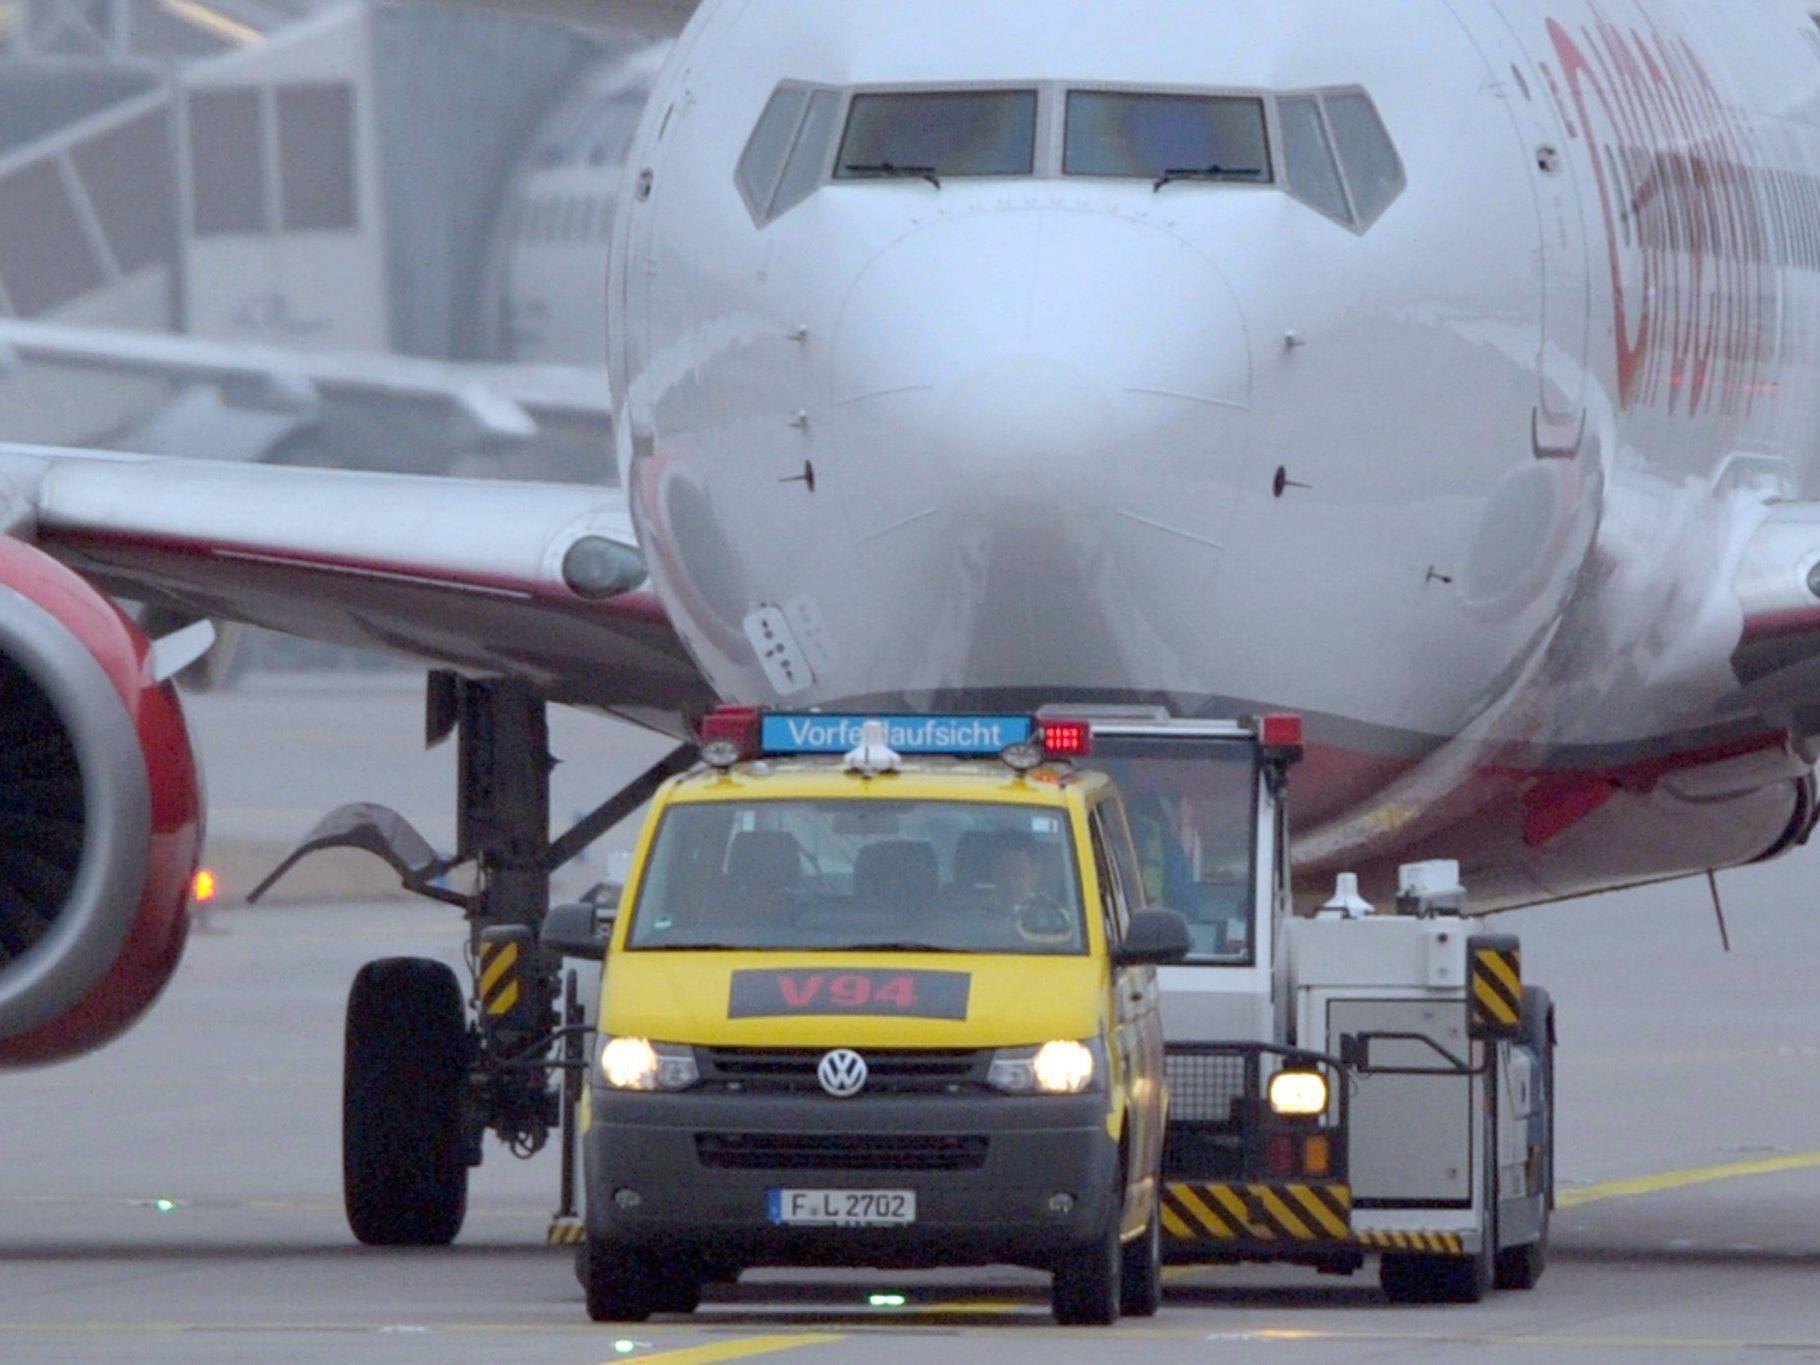 Am Frankfurter Flughafen droht durch Streiks ein Verkehrschaos.